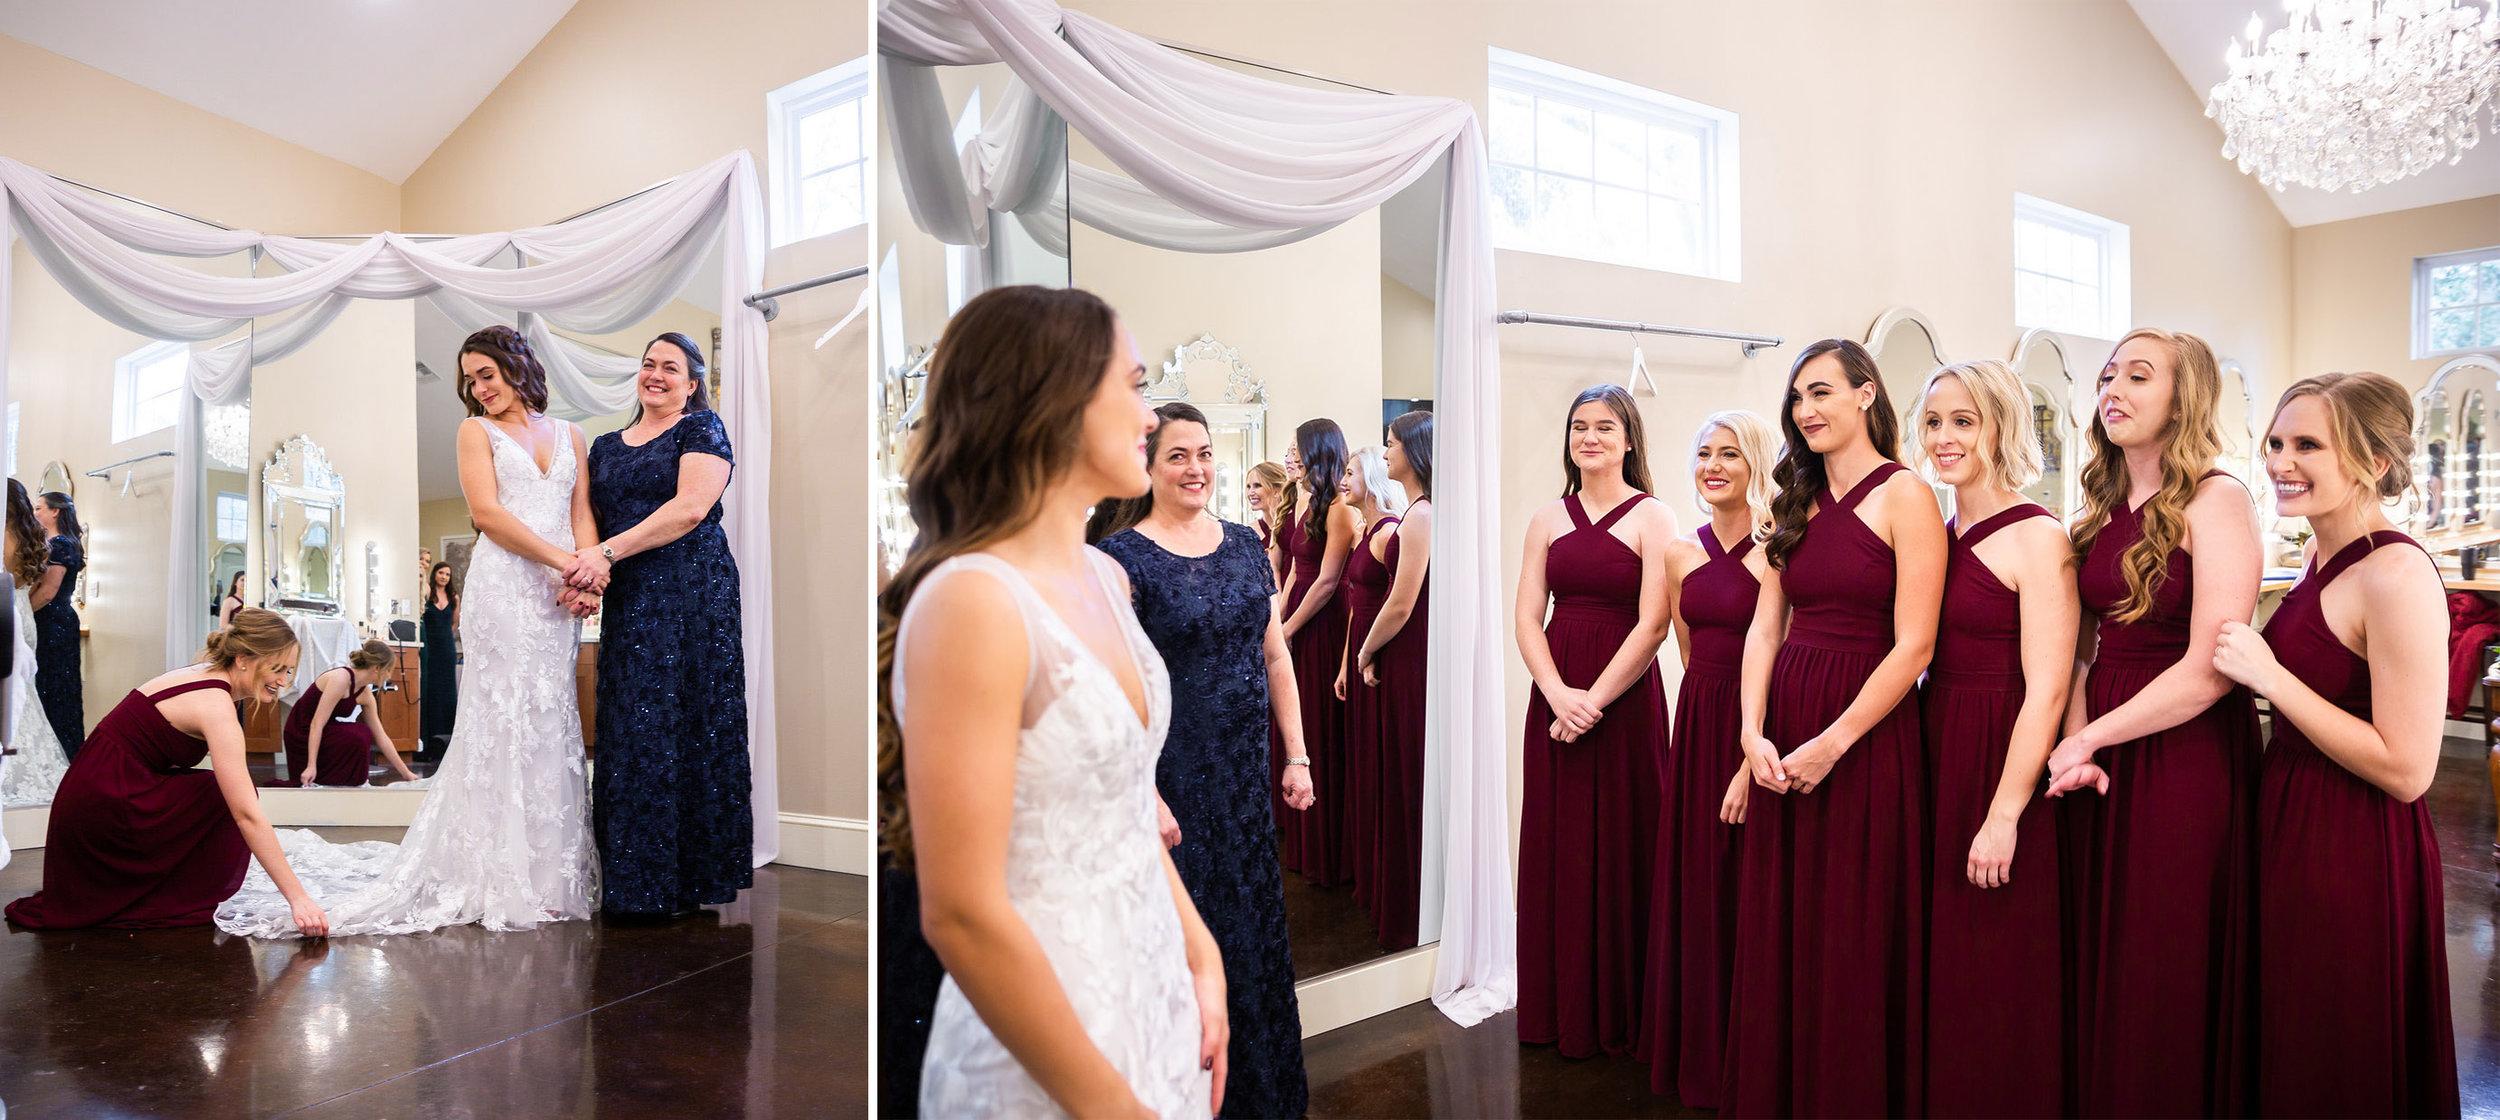 adam-szarmack-bowing-oaks-wedding-photographer-jacksonville-38.jpg